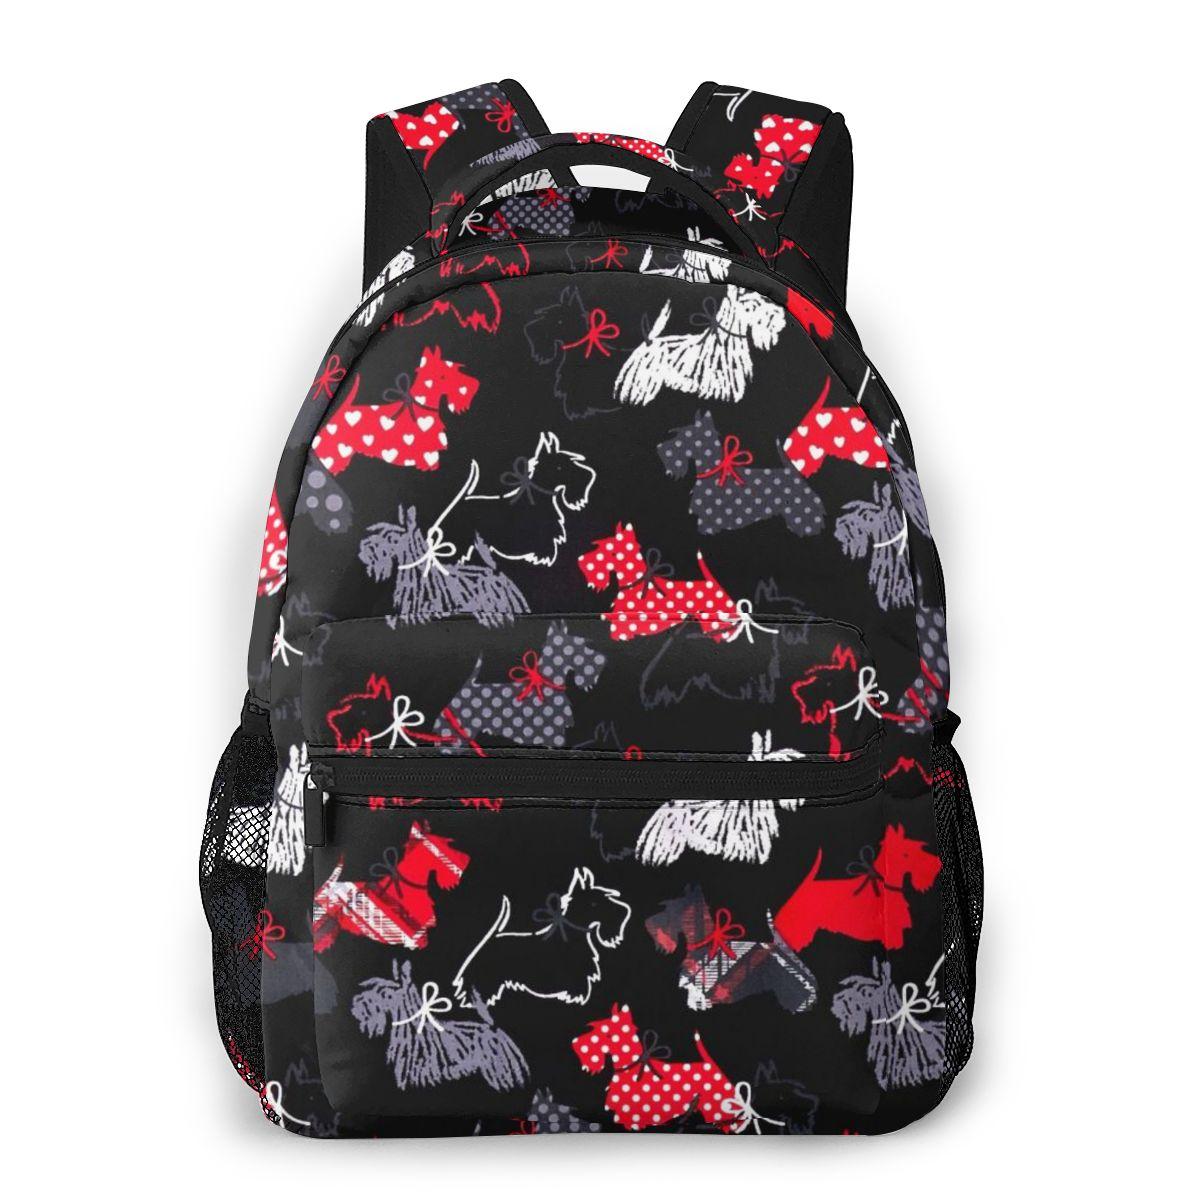 Westie-حقيبة ظهر سكوتش ترير للرجال والنساء ، حقيبة طالب مطبوعة بالحيوانات ، حقيبة كتب عصرية عالية الجودة للنساء ، Laptopbag